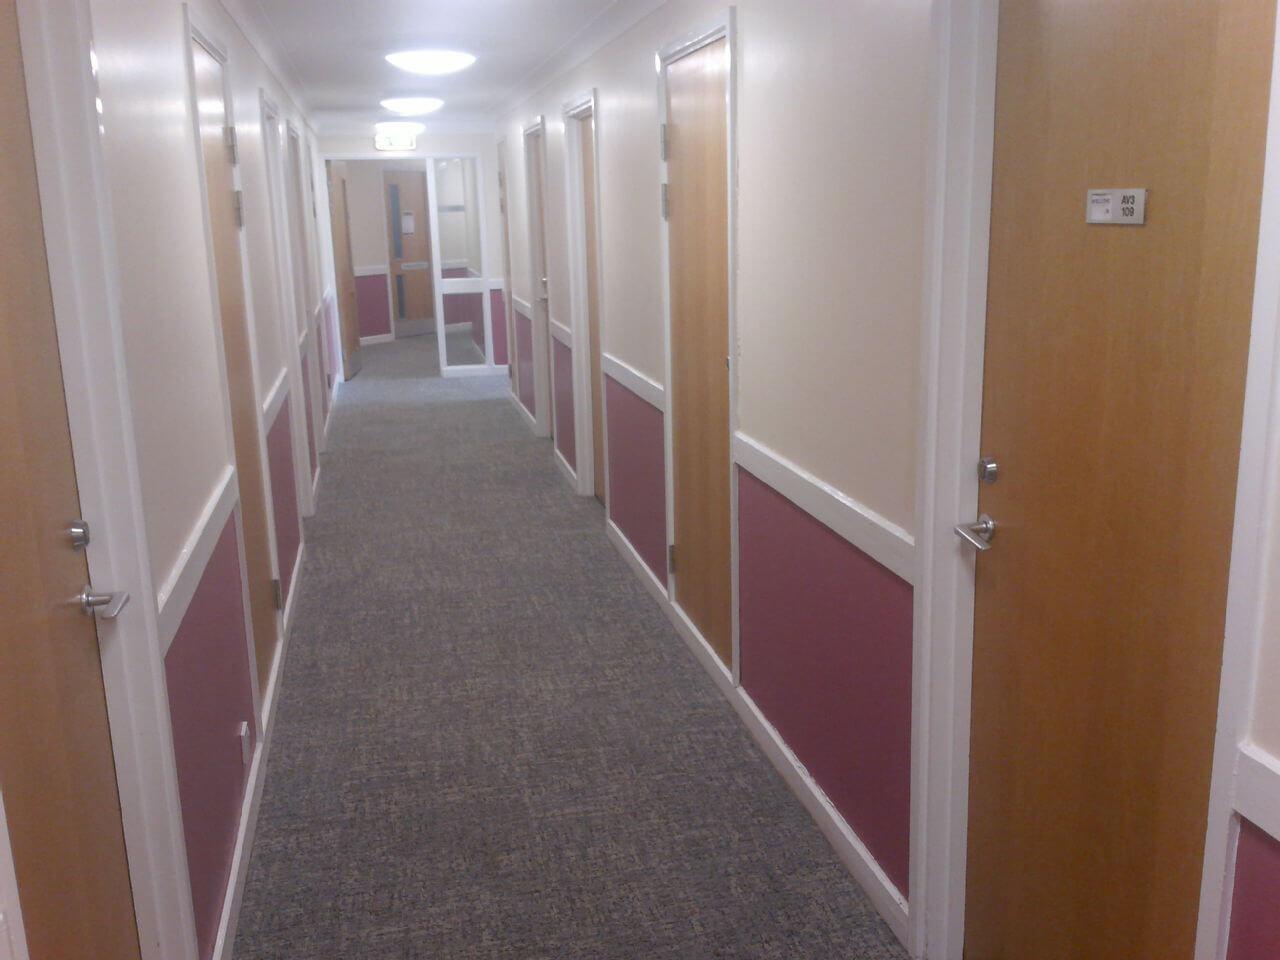 AV Corridor